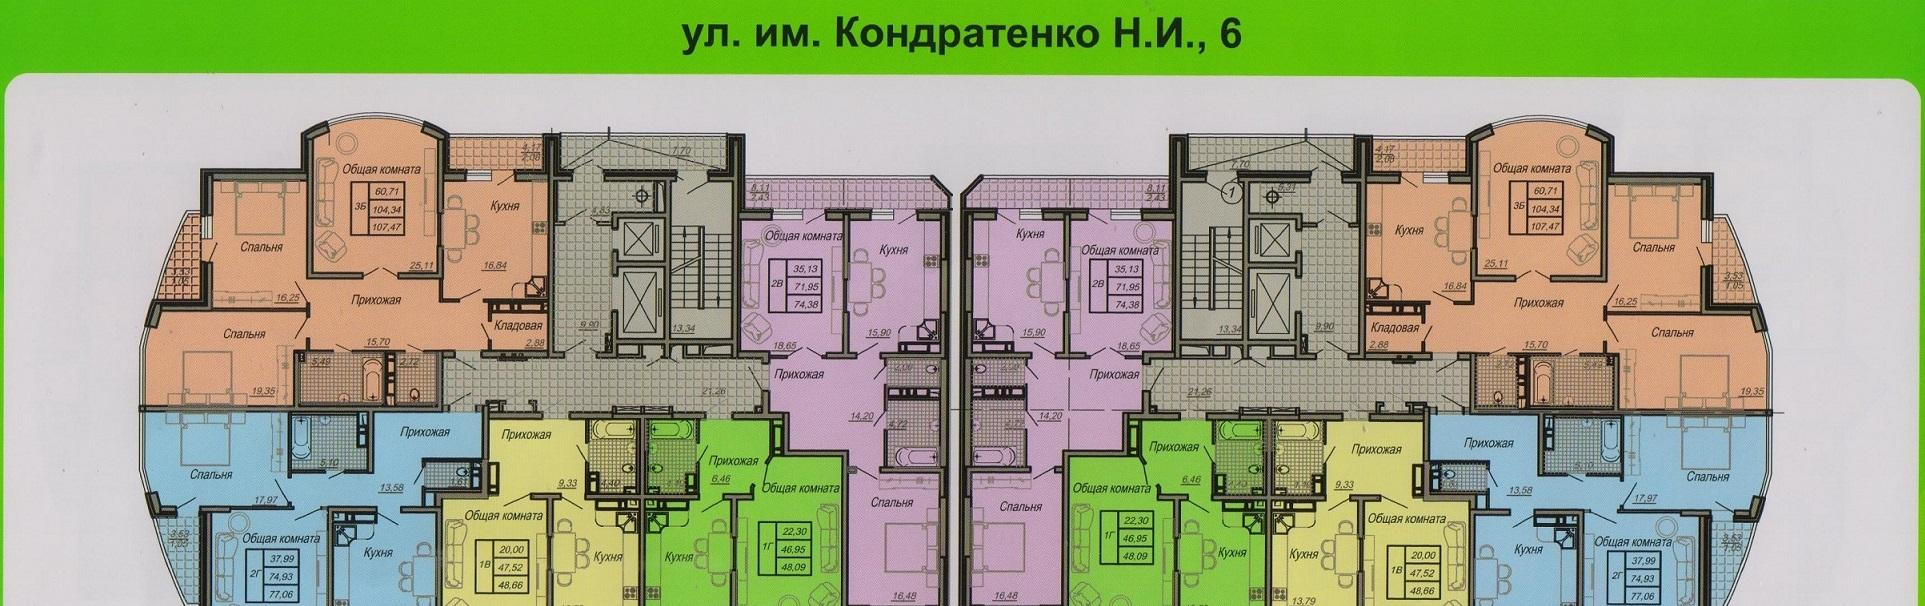 Планировки ЖК им. Кондратенко Н.И., 6 Краснодар | план - 1